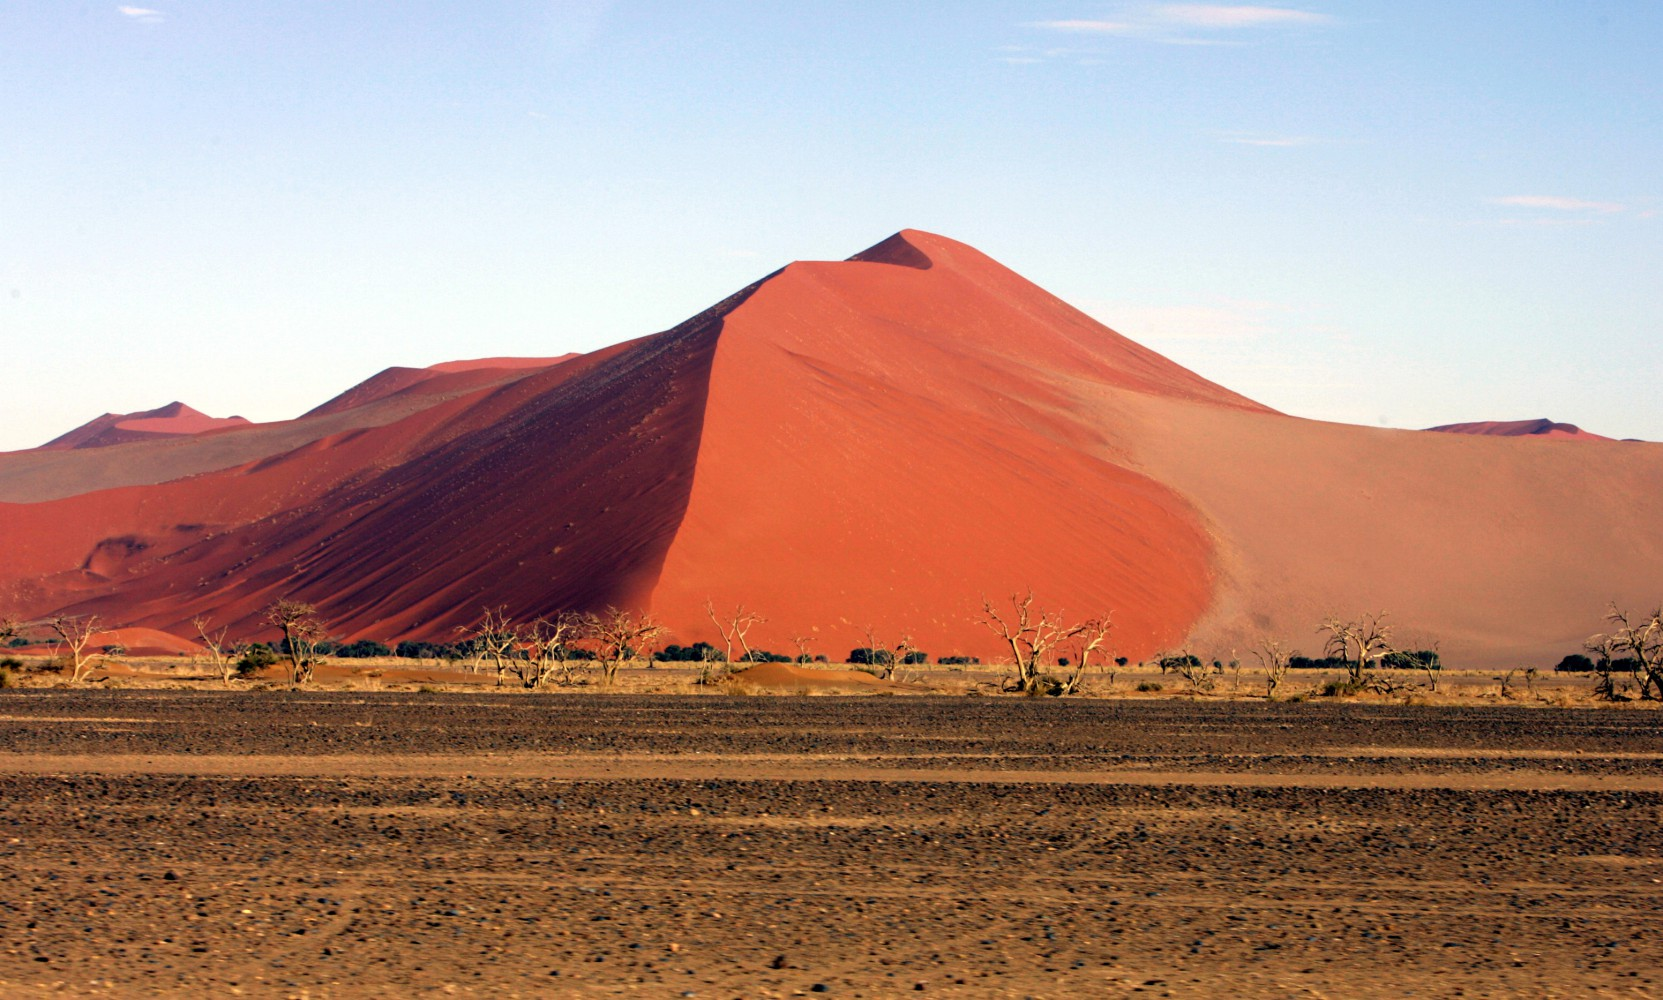 Tchibo Cafissimo Cooking for friends in Namibia 29.12.05-2.01.06 Sanddünen von Sossusvlei